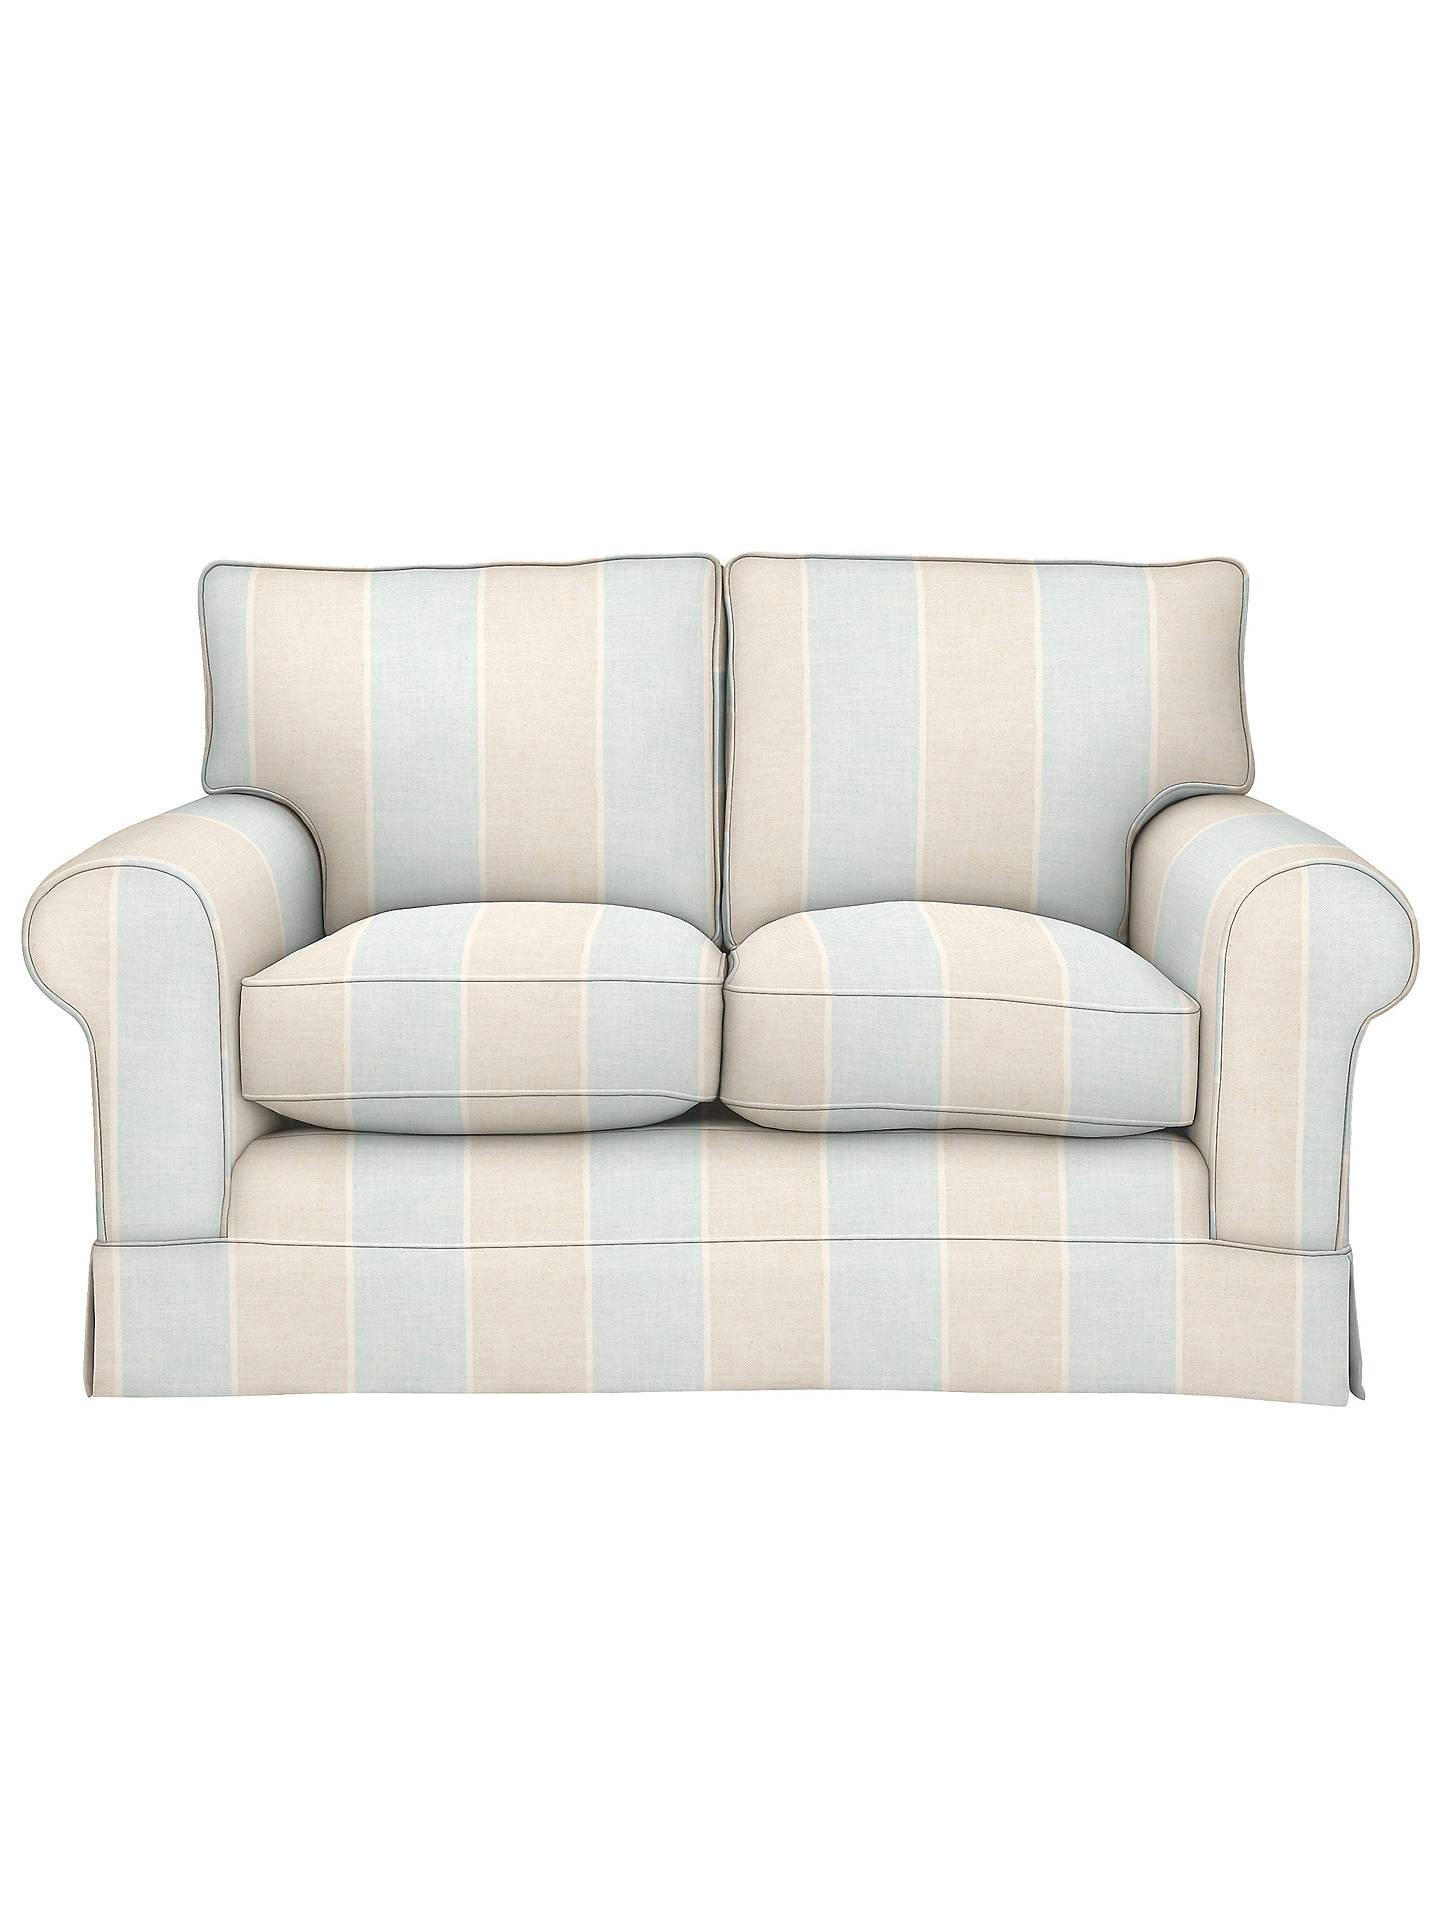 john lewis padstow small 2 seater sofa brampton jumbo. Black Bedroom Furniture Sets. Home Design Ideas